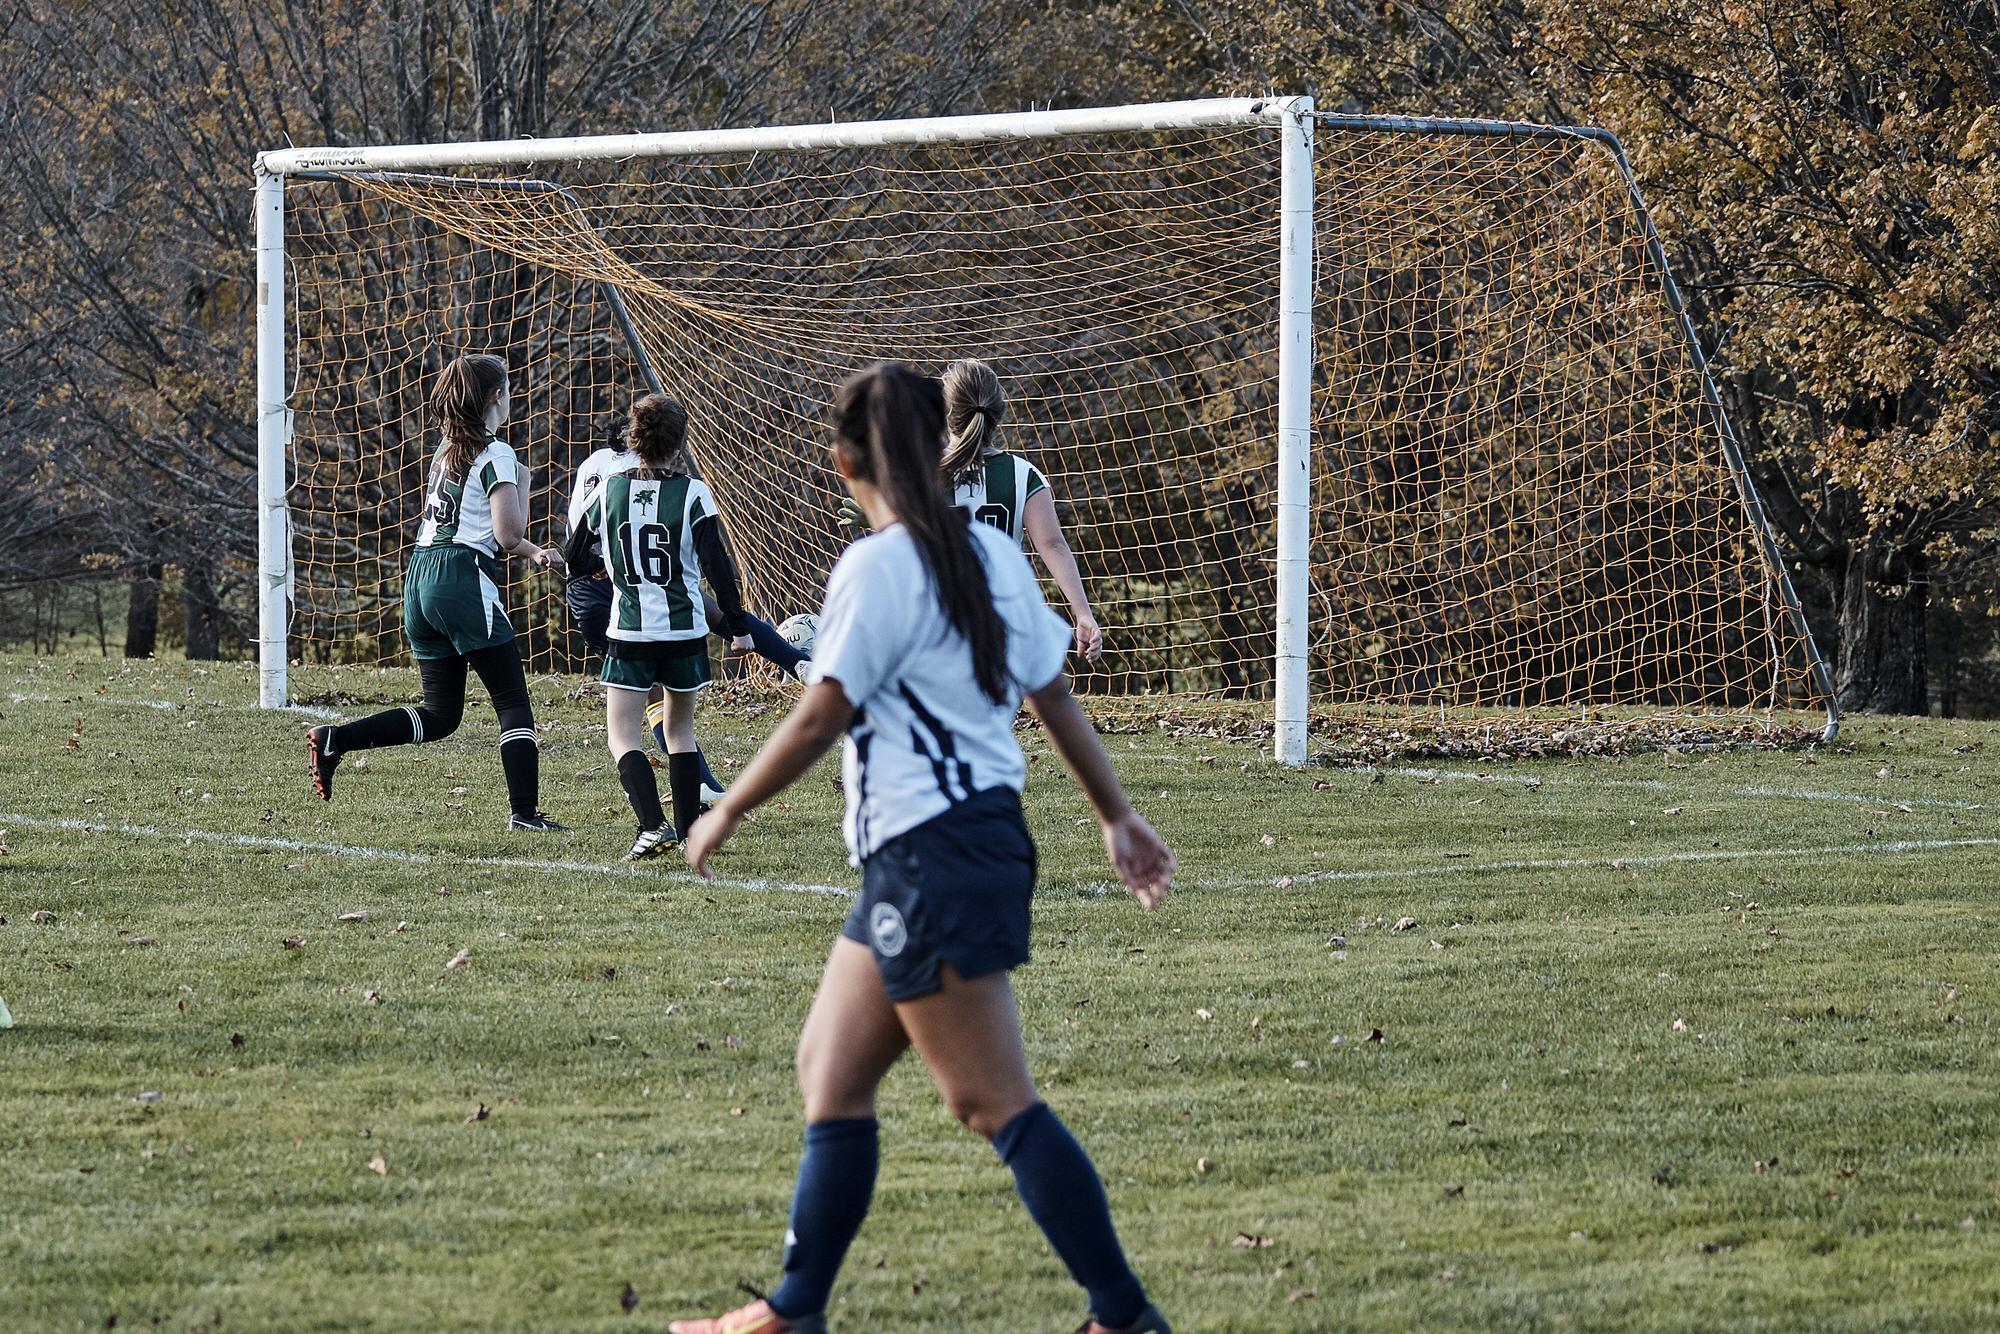 Girls Varsity Soccer vs. Putney School - October 26, 2018 - 044.jpg